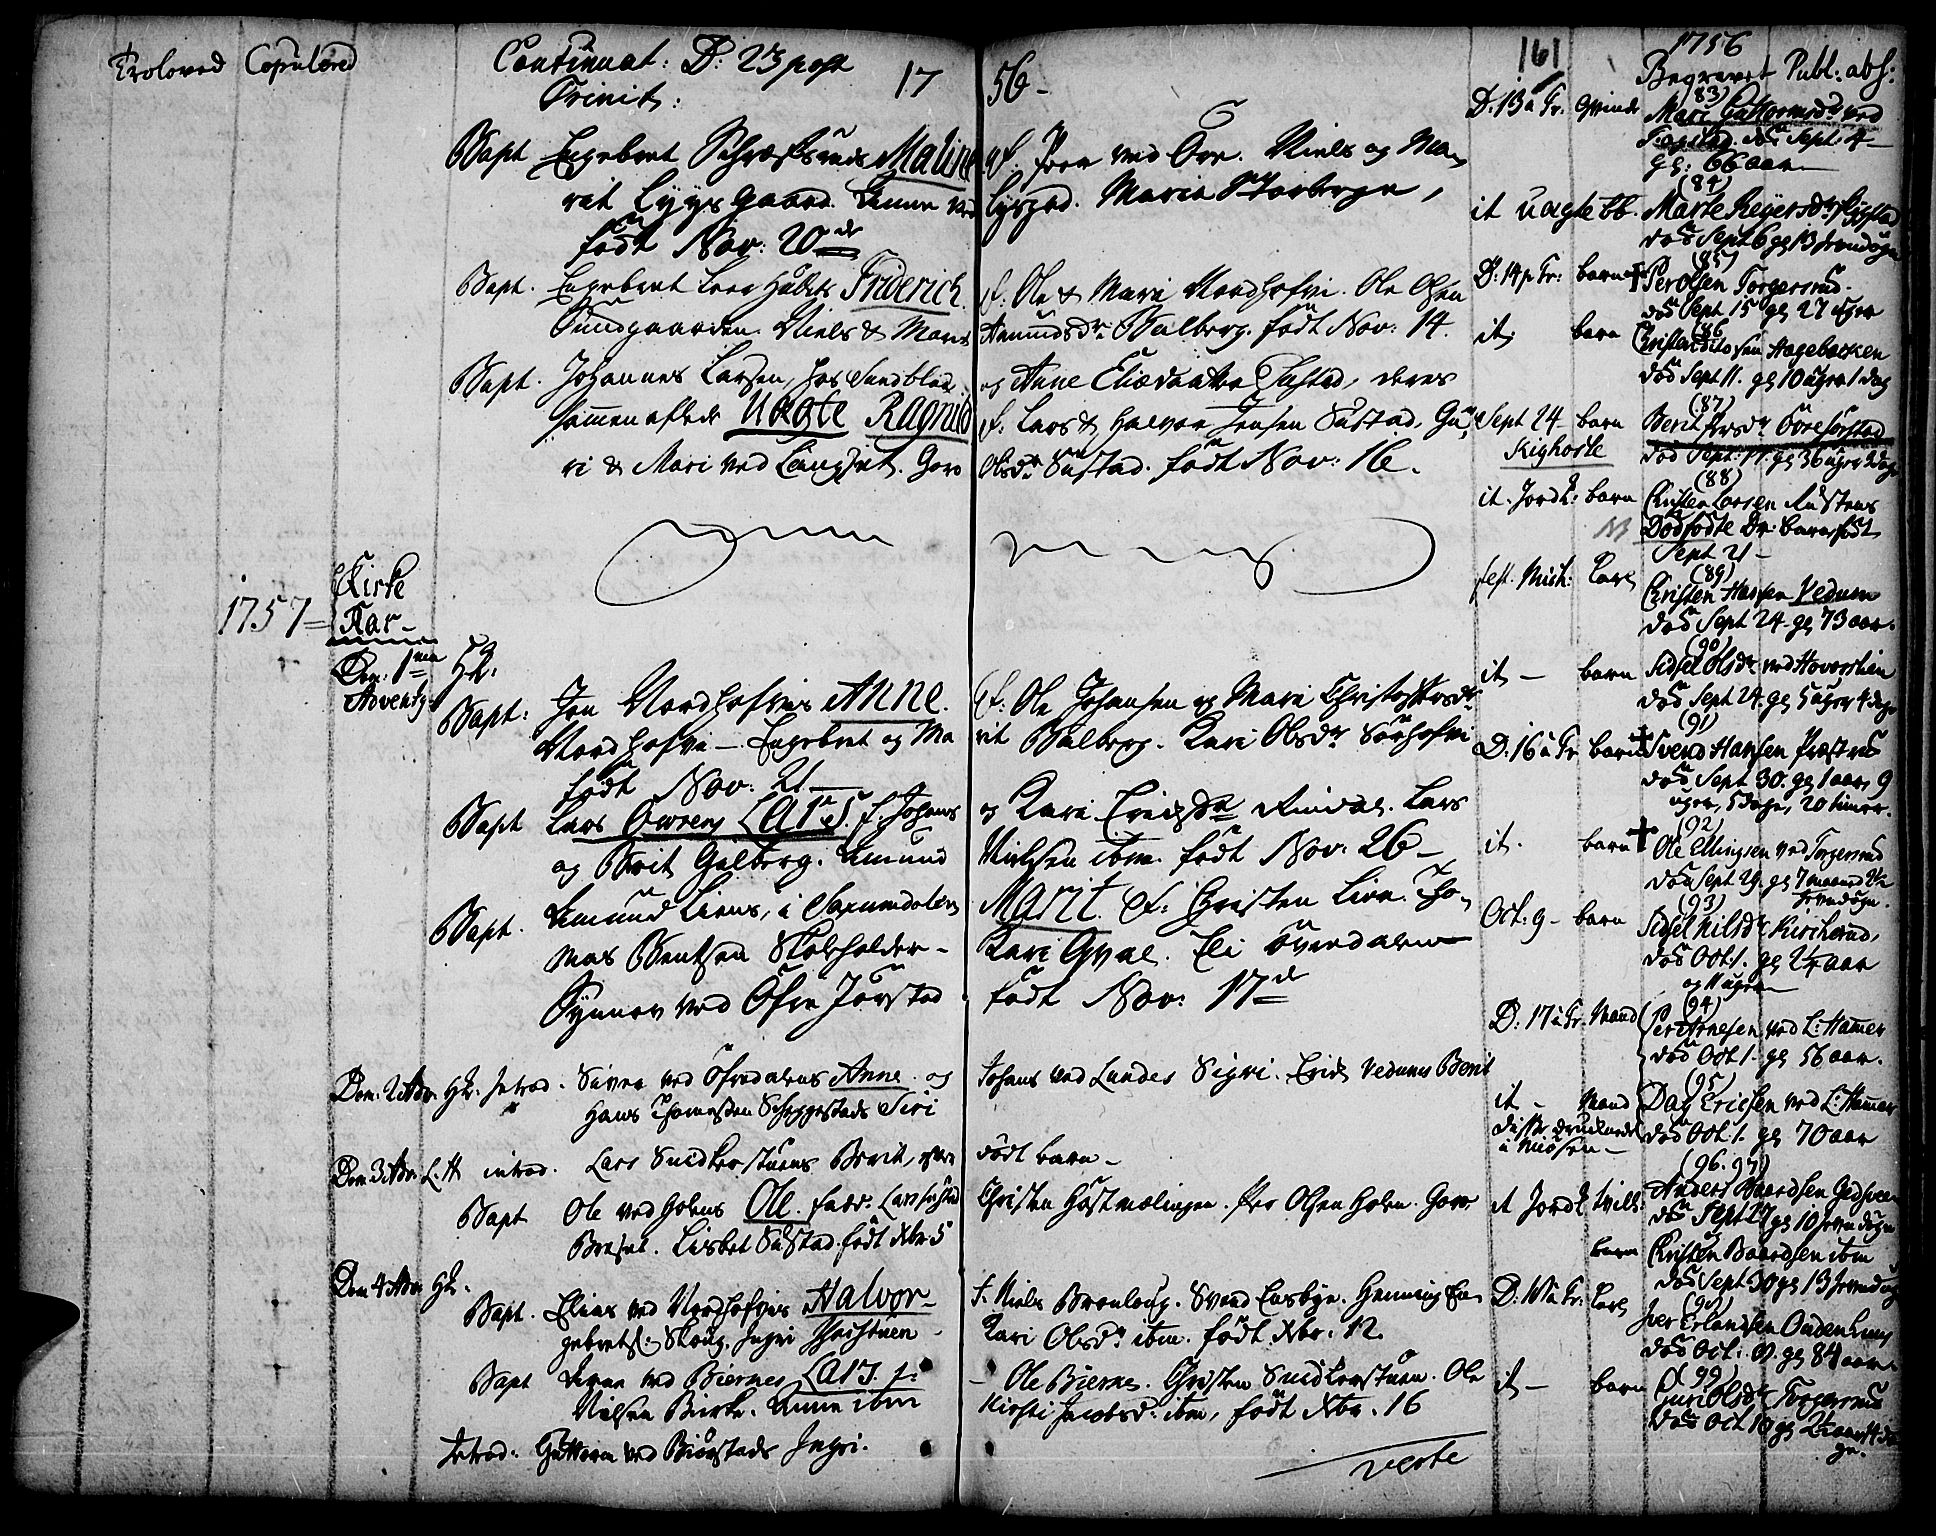 SAH, Fåberg prestekontor, Ministerialbok nr. 1, 1727-1775, s. 161